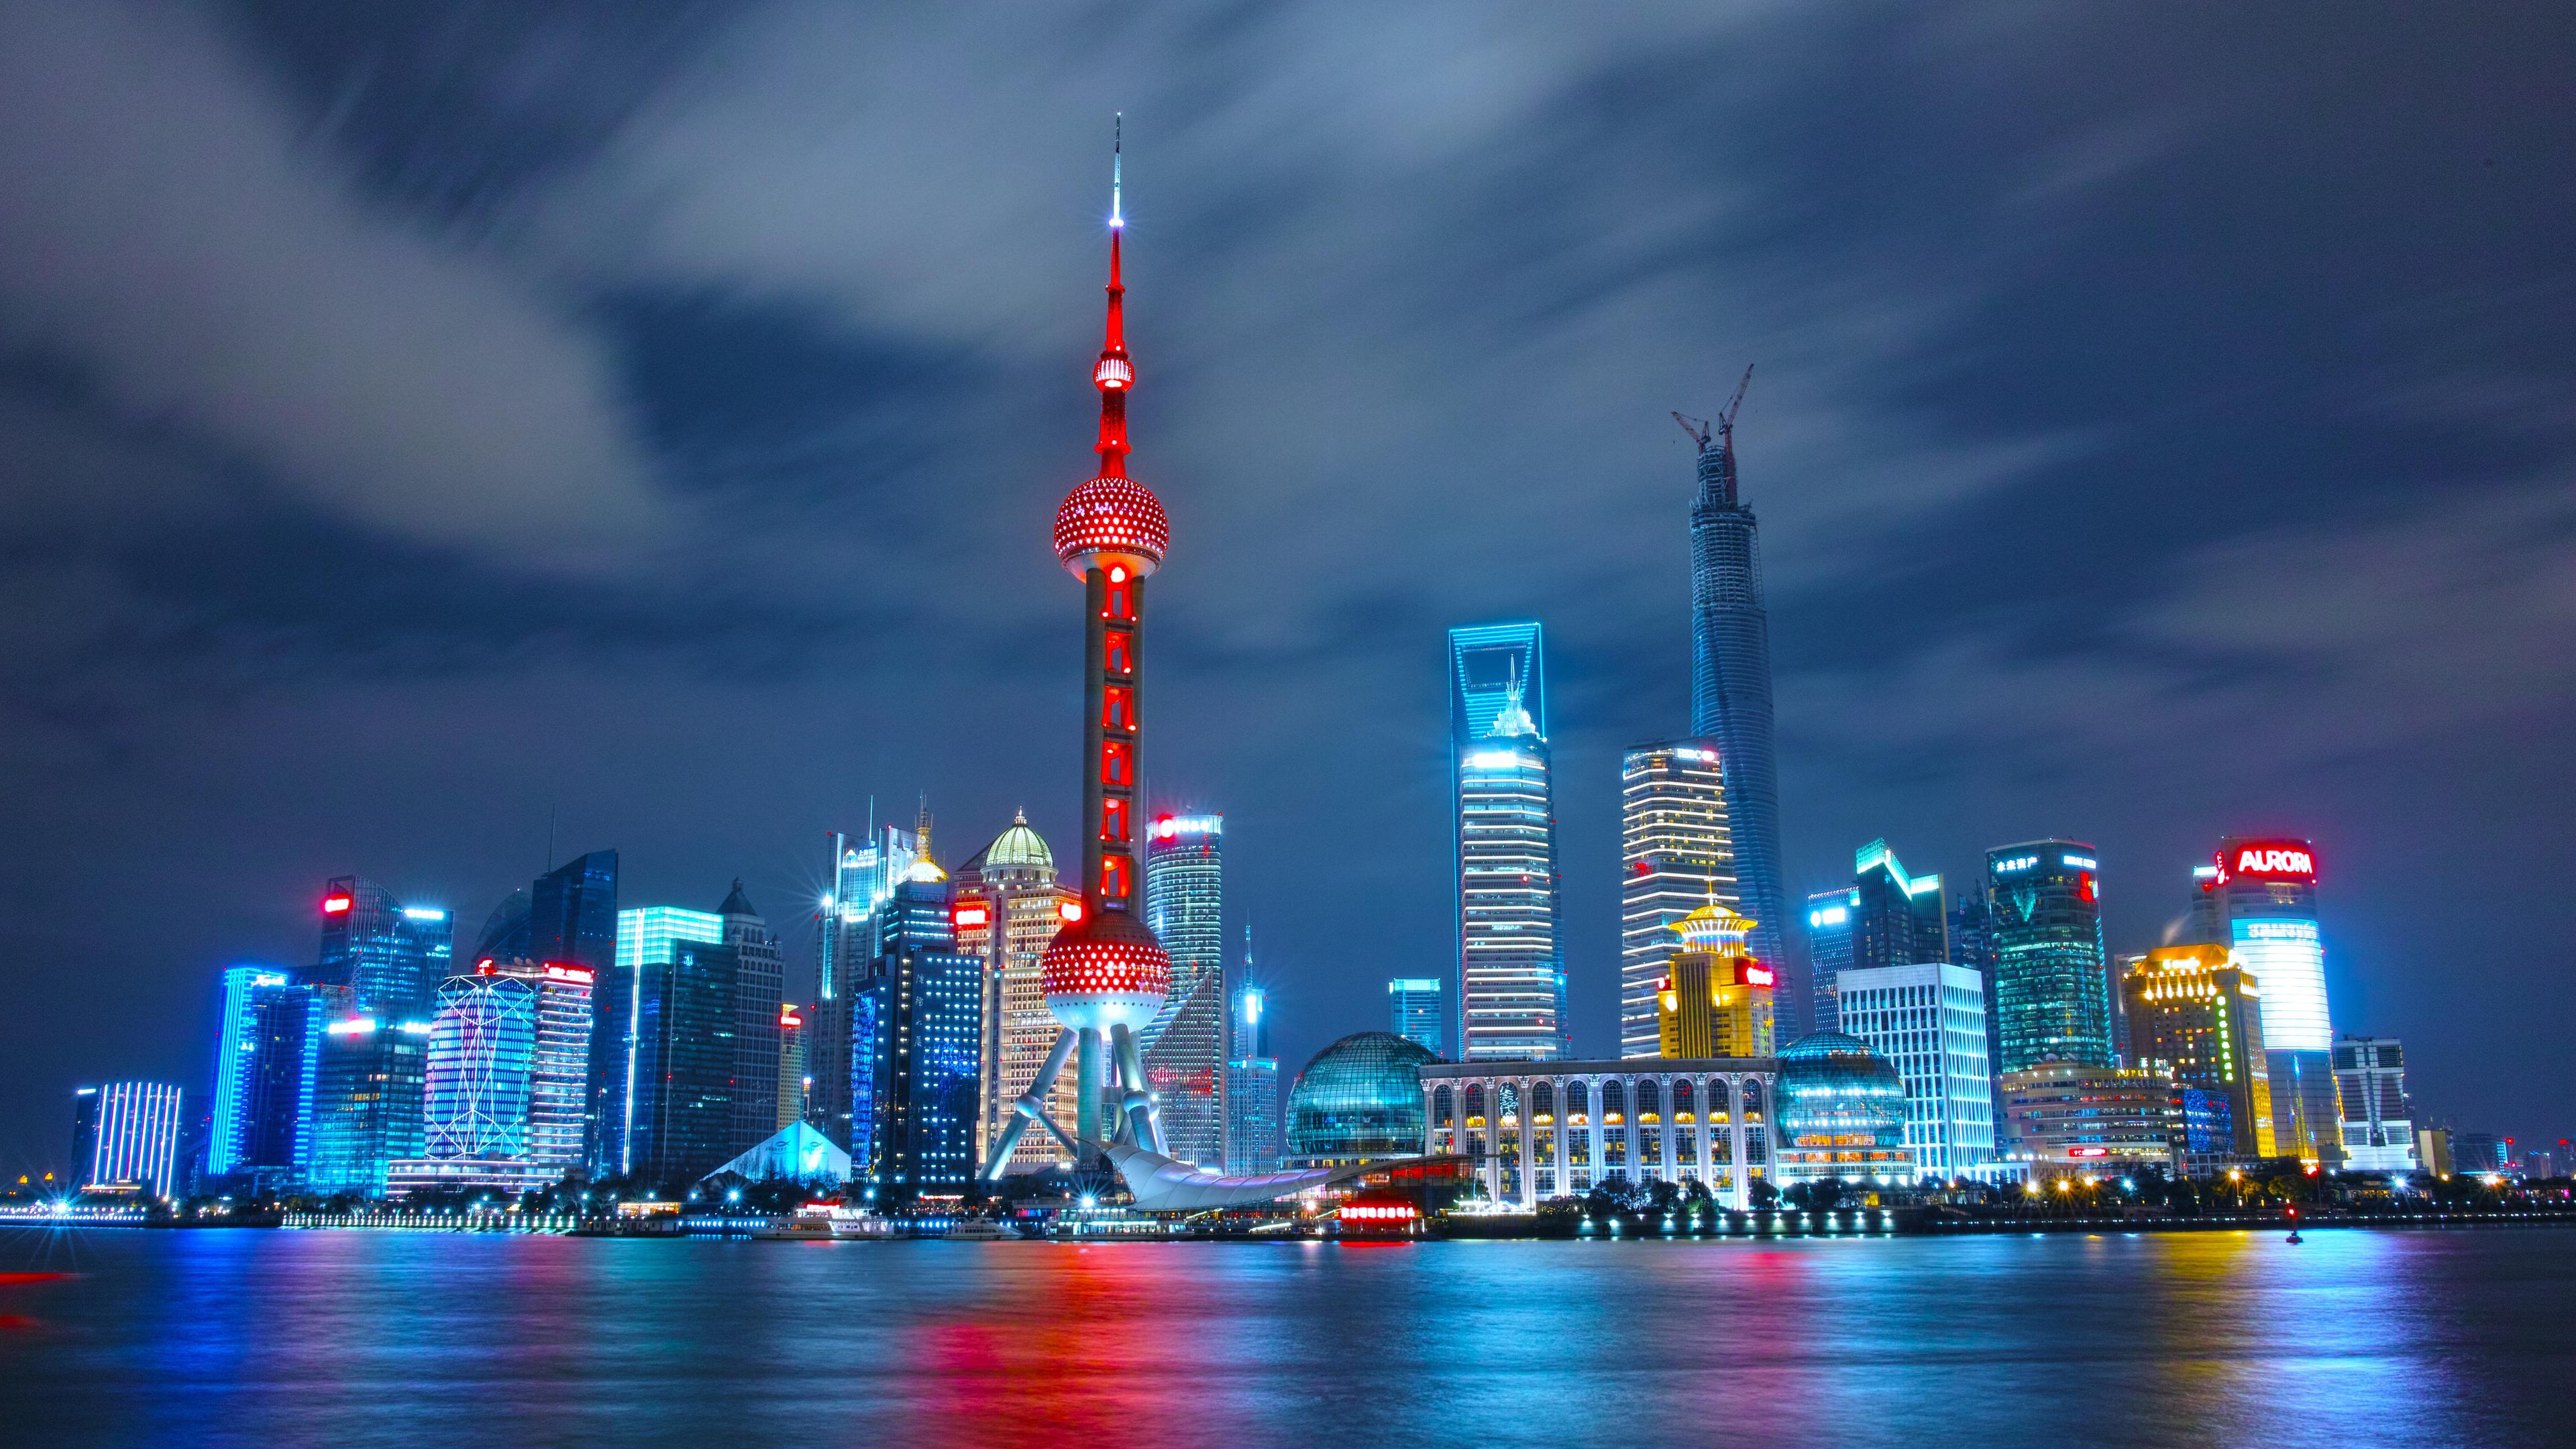 wai tan shanghai china world 4k 1560535884 - Wai Tan Shanghai China World 4k - skyscraper wallpapers, shanghai wallpapers, photography wallpapers, hd-wallpapers, cityscape wallpapers, 4k-wallpapers